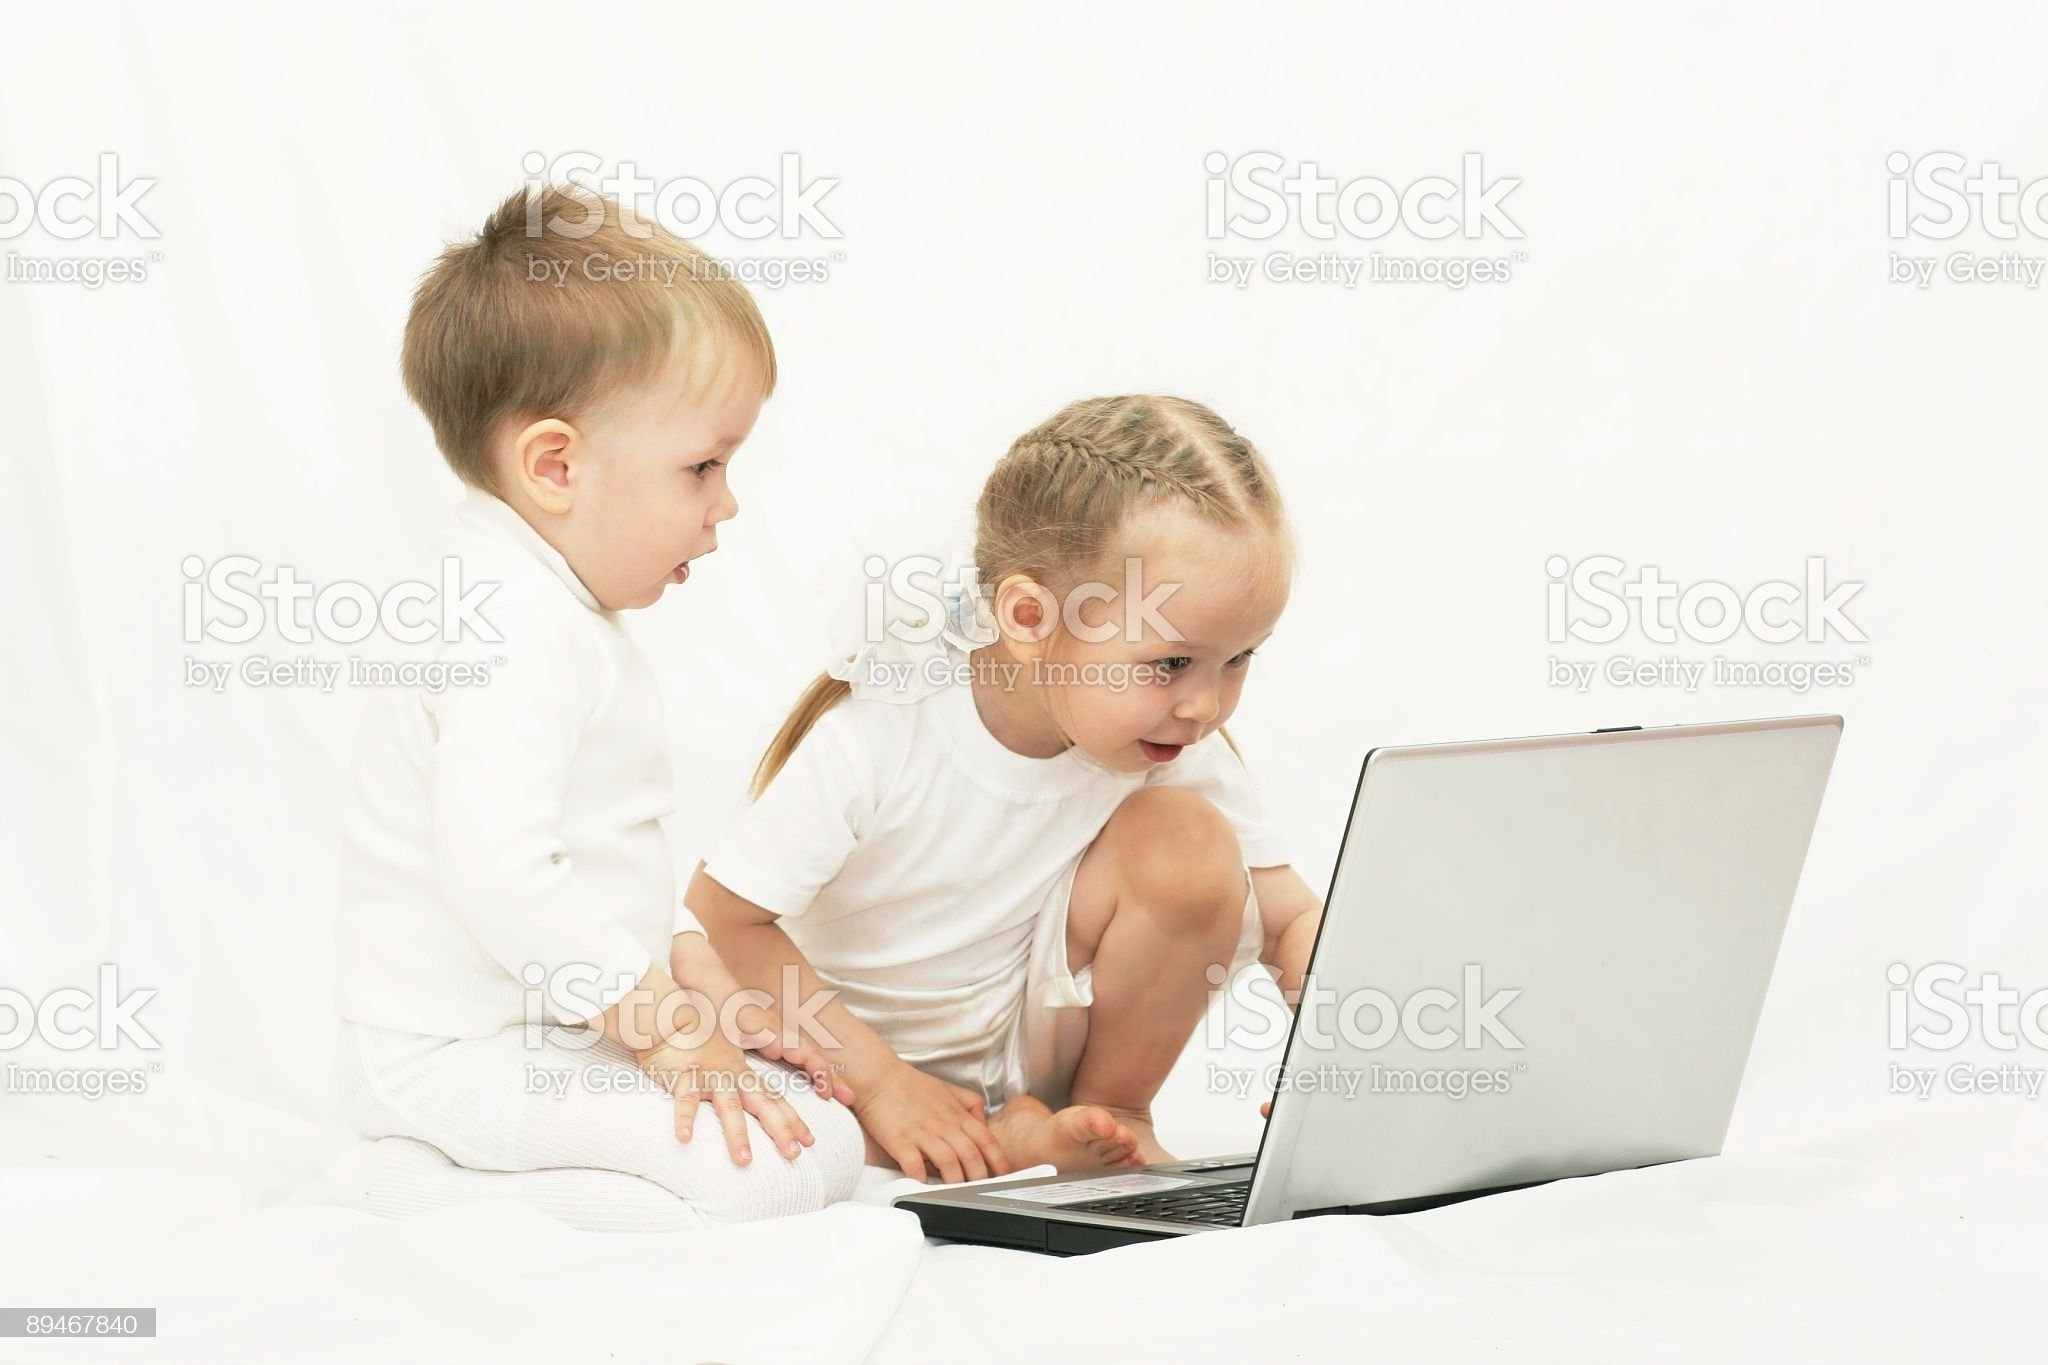 Children using notebook royalty-free stock photo